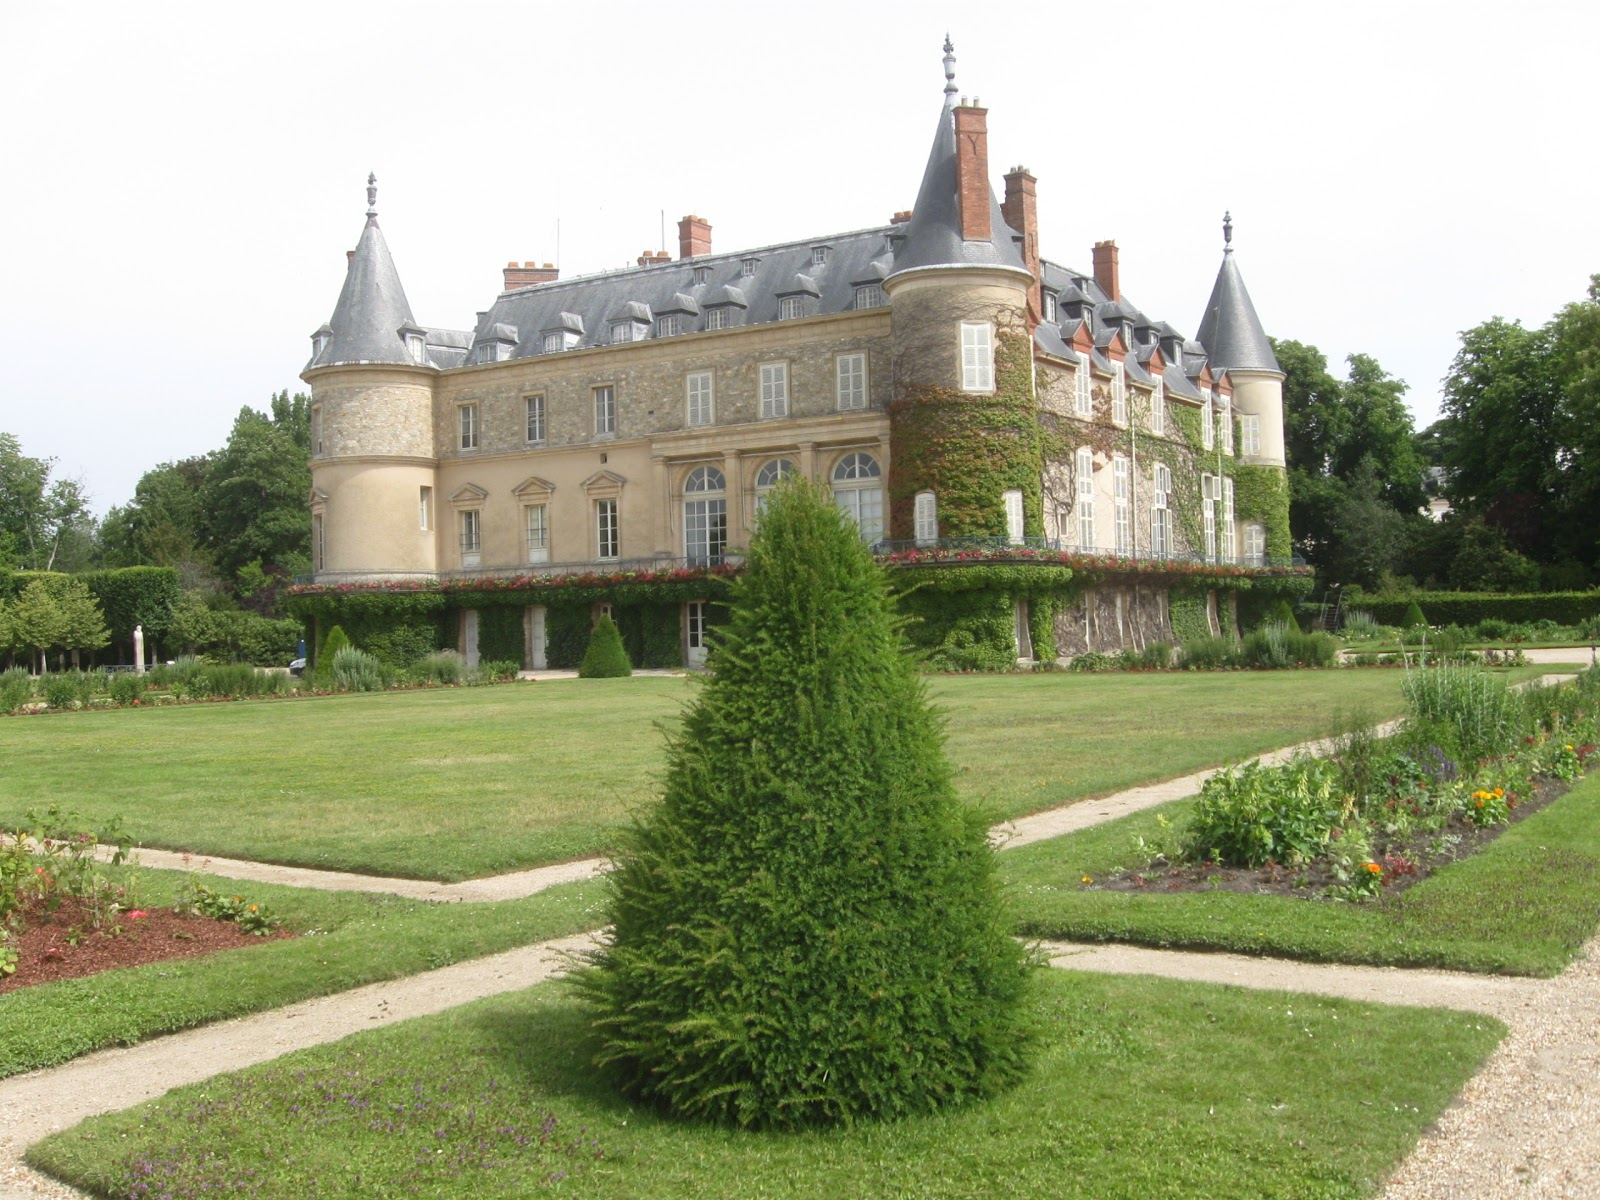 Heliosse ii n 714 le ch teau de rambouillet for Chateaux yvelines visites